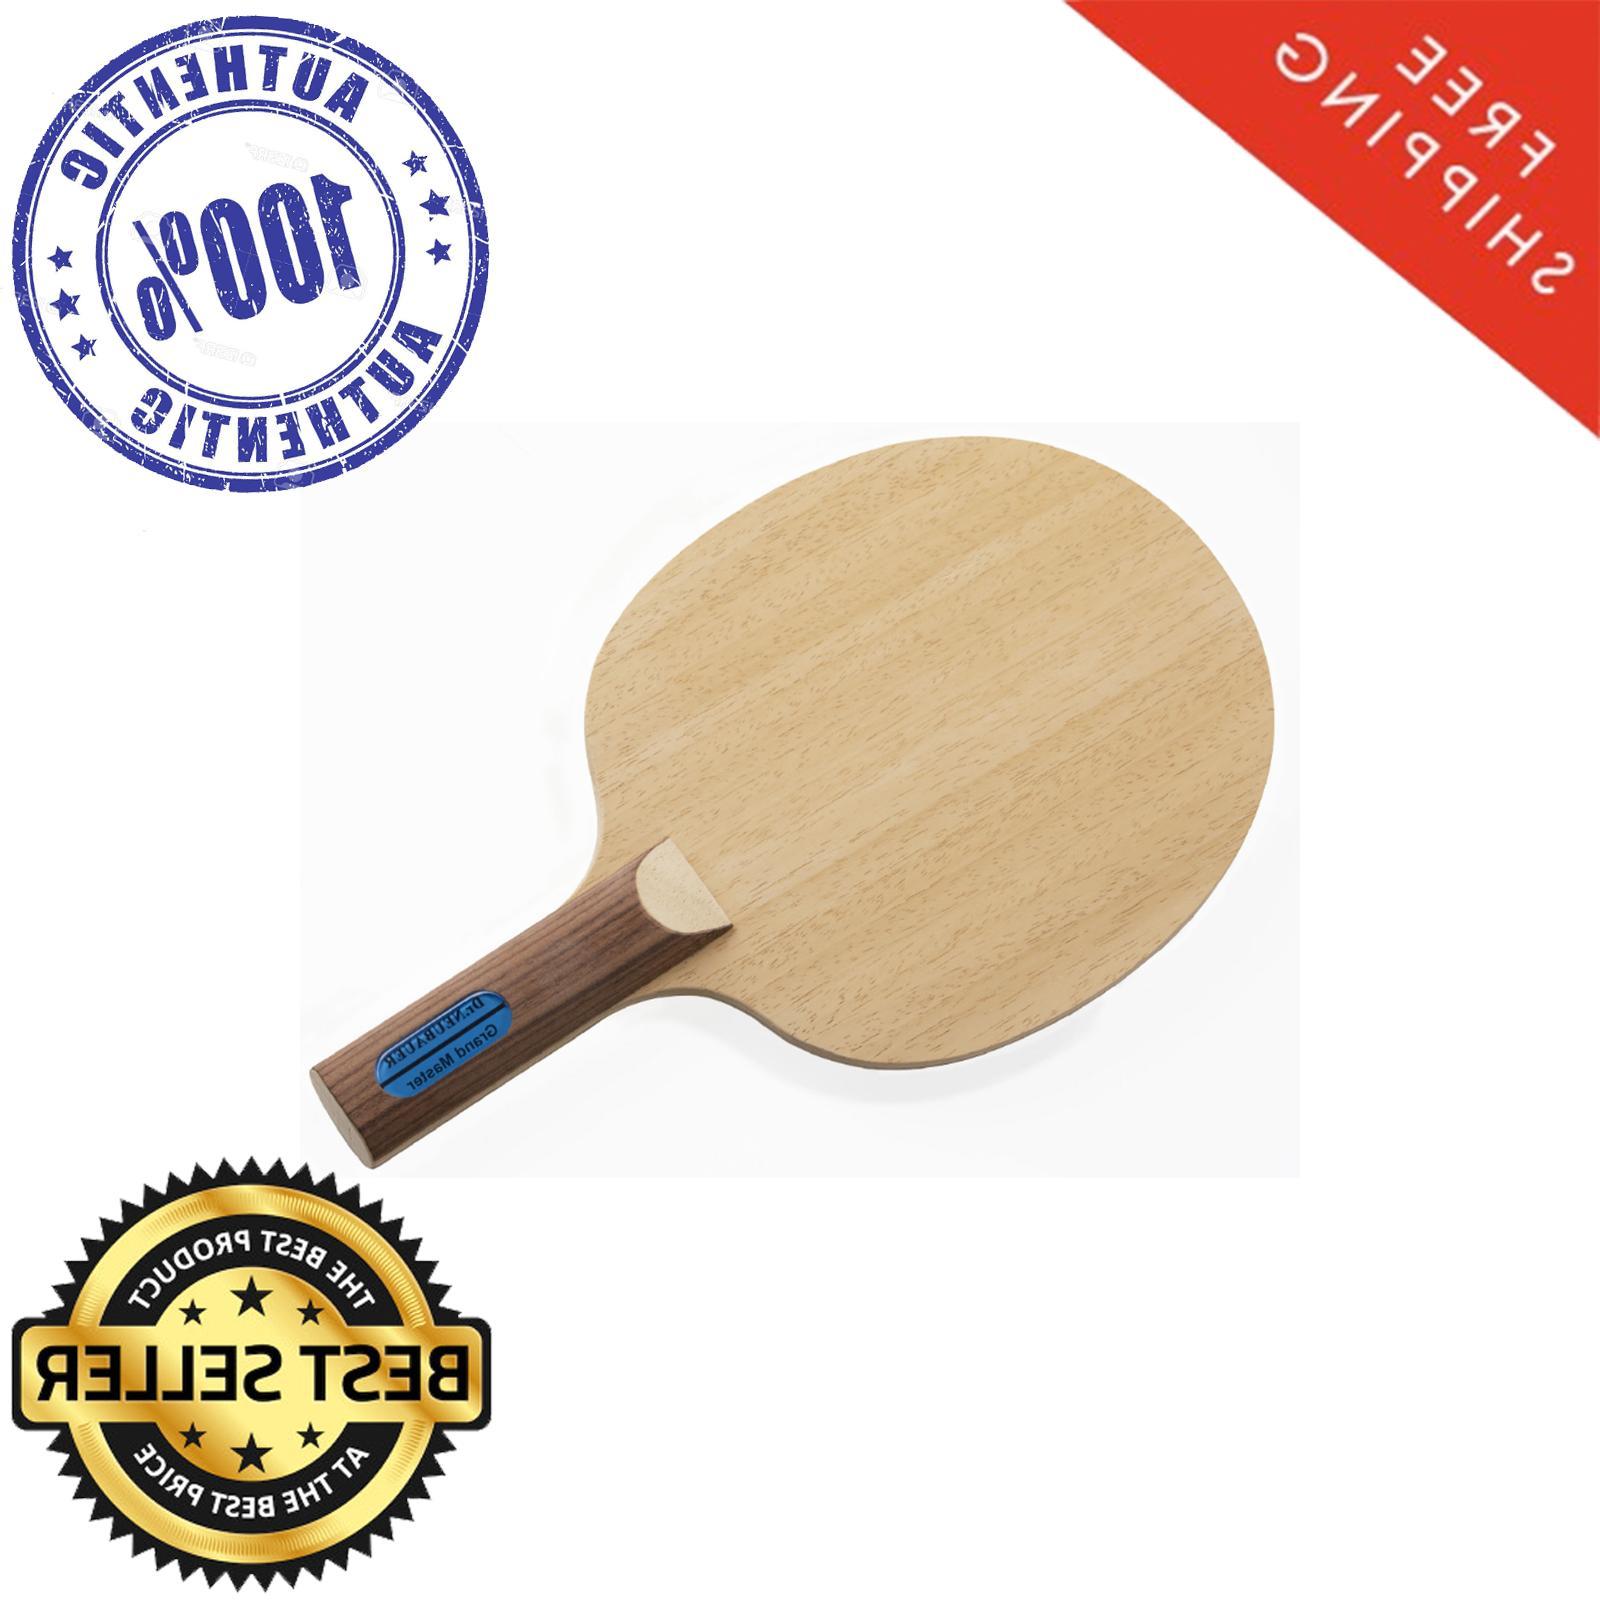 dr neubauer grand master table tennis